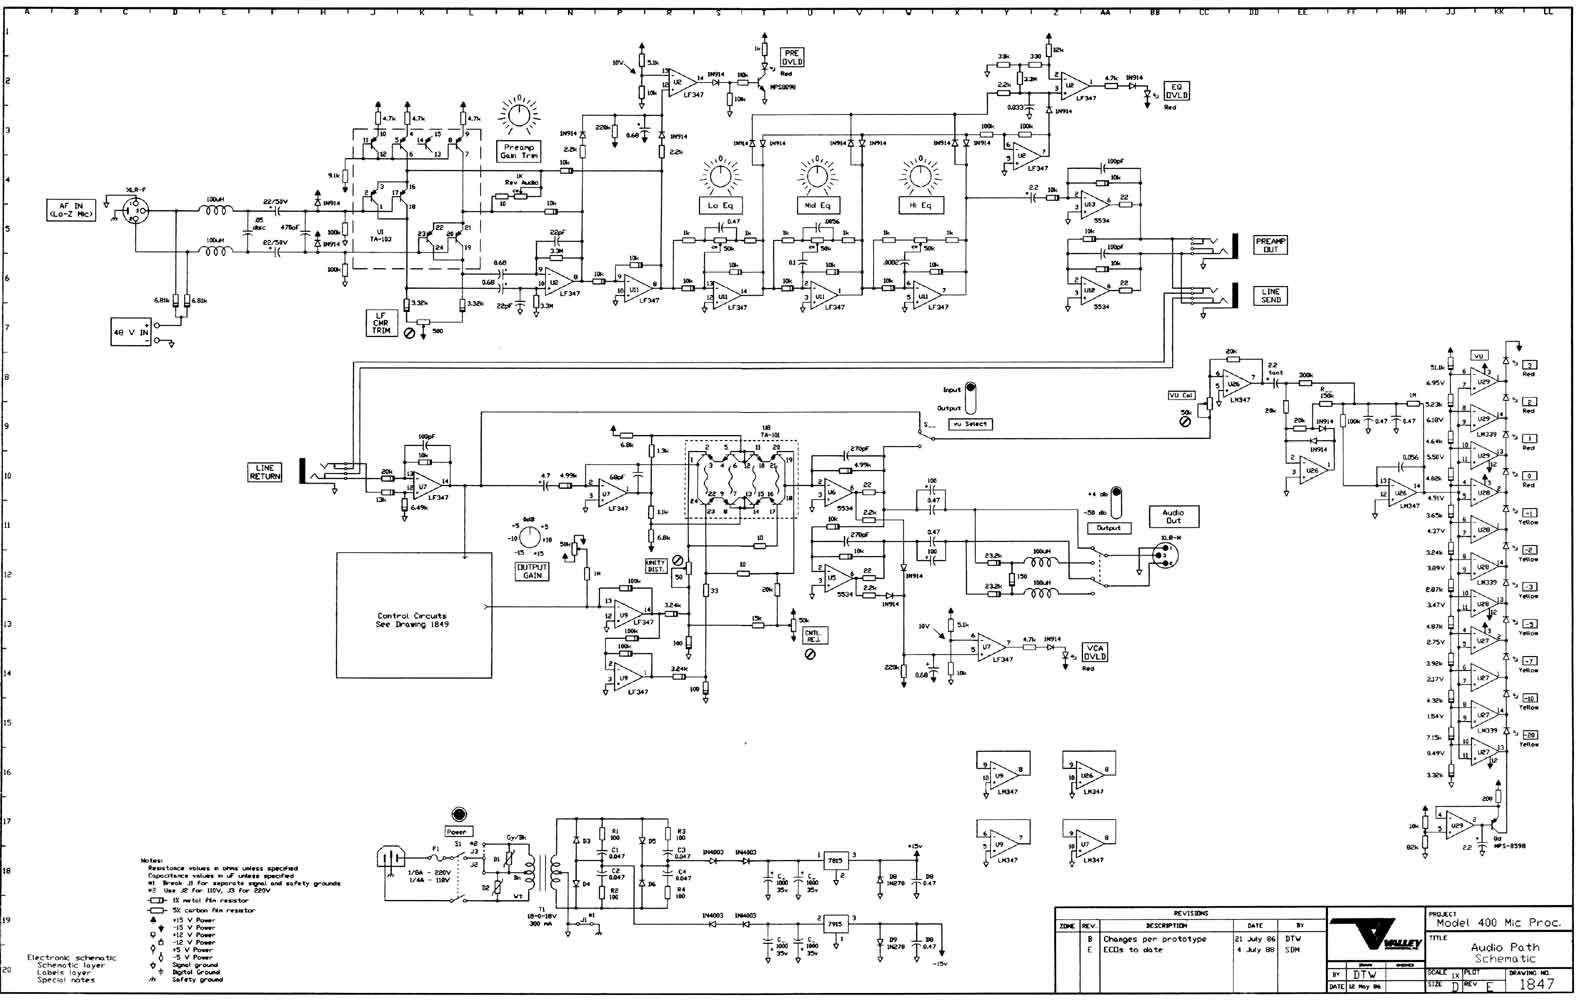 valley 400 mic processor schematic rh www225 pair com 4004 processor schematic computer processor schematic